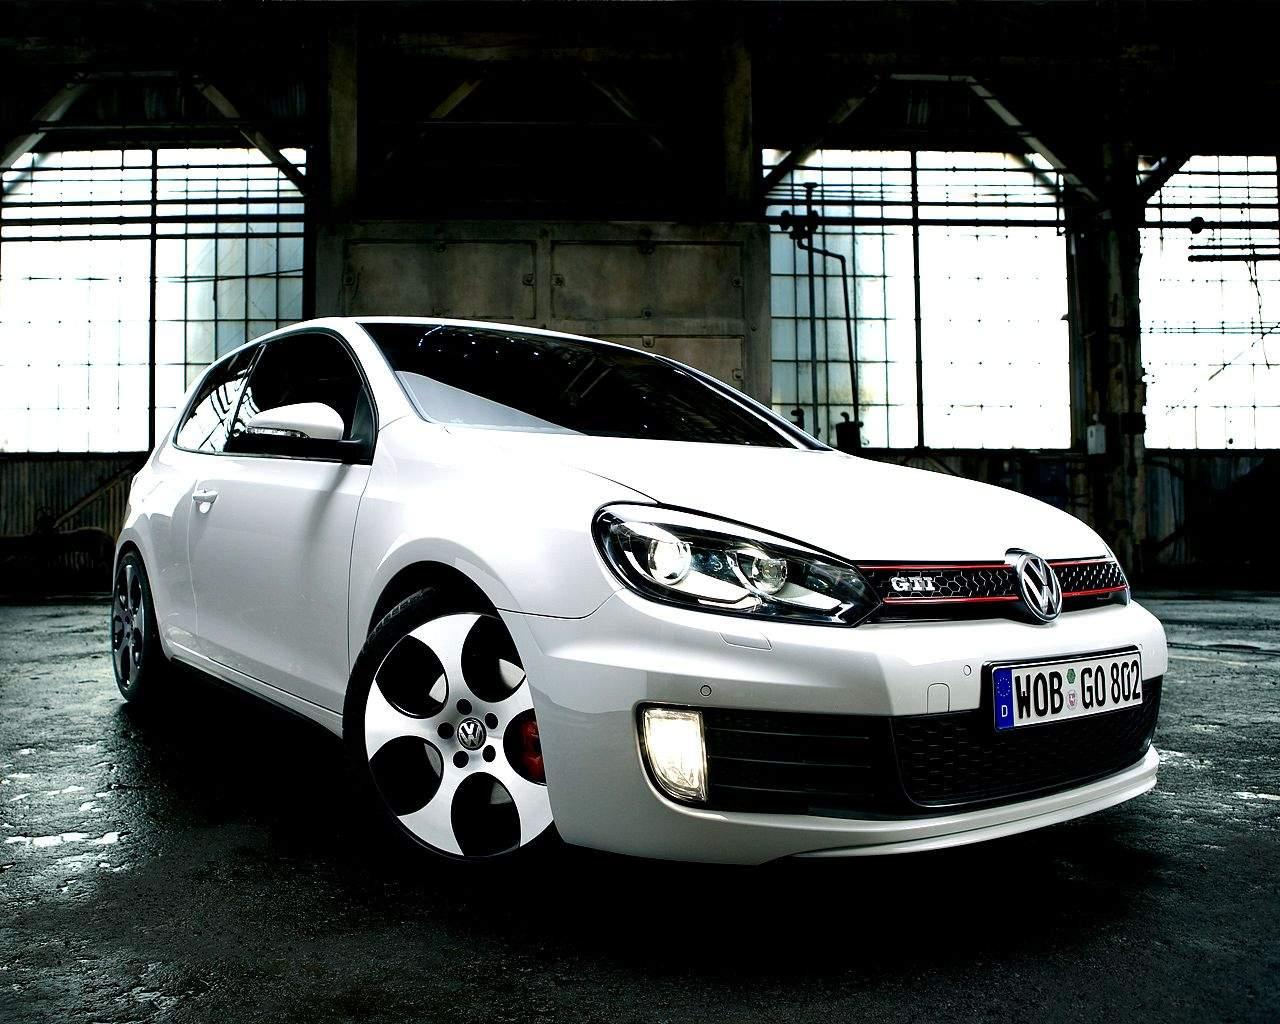 http://1.bp.blogspot.com/-IMFCE0koLUw/T6QZNAACtaI/AAAAAAAAKCY/tvDJo9Weapk/s1600/cars_vw_golf_gti_mk6_wallpaper.jpg